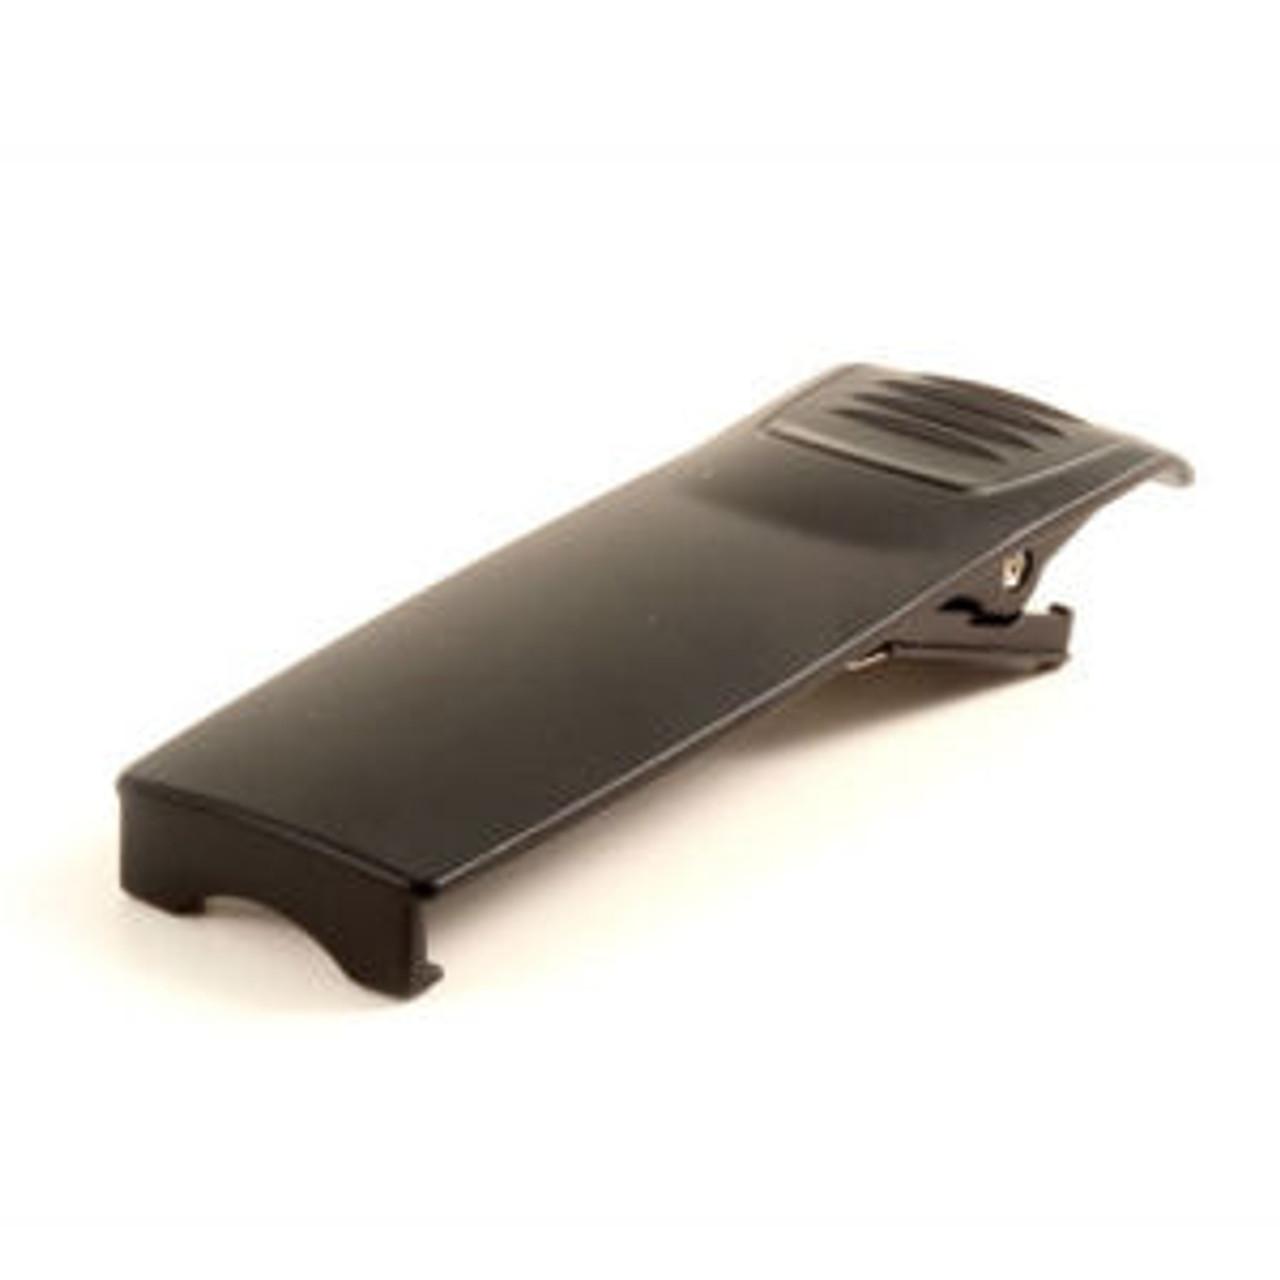 M/A-Com P7100IP Metal, Spring Loaded Belt Clip